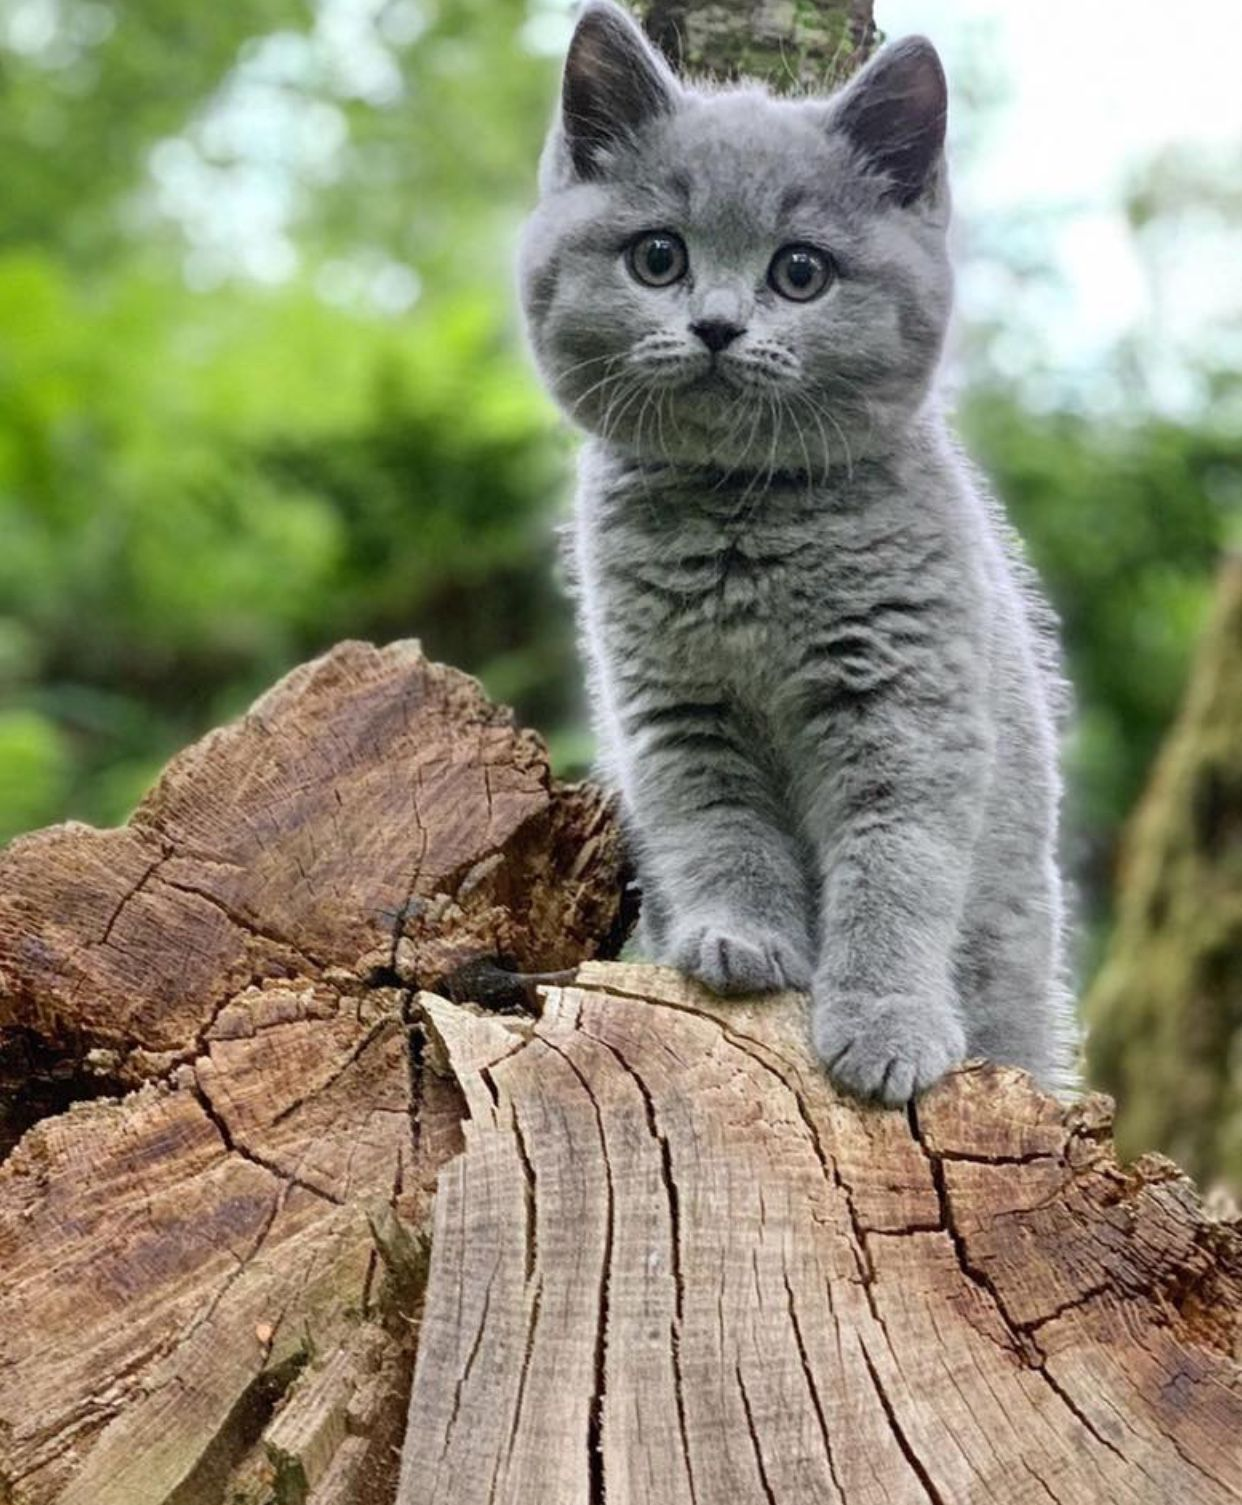 Pin By Inez Joyce Grove On The Fiery Cross Season 5 Outlander Cats Cute Cats And Kittens